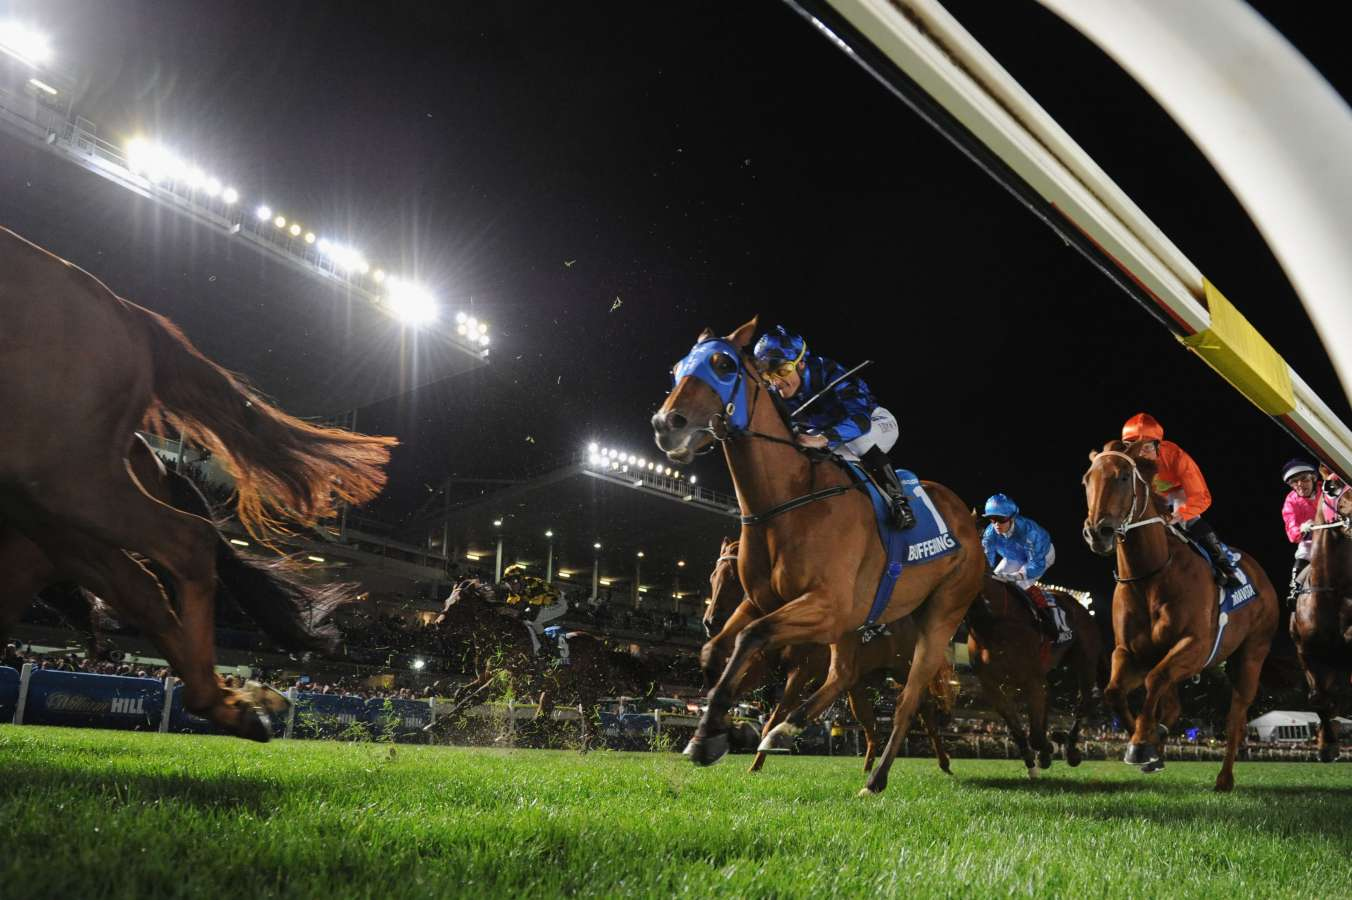 Fantasy Horse Racing Tips: Friday October 25th 2019